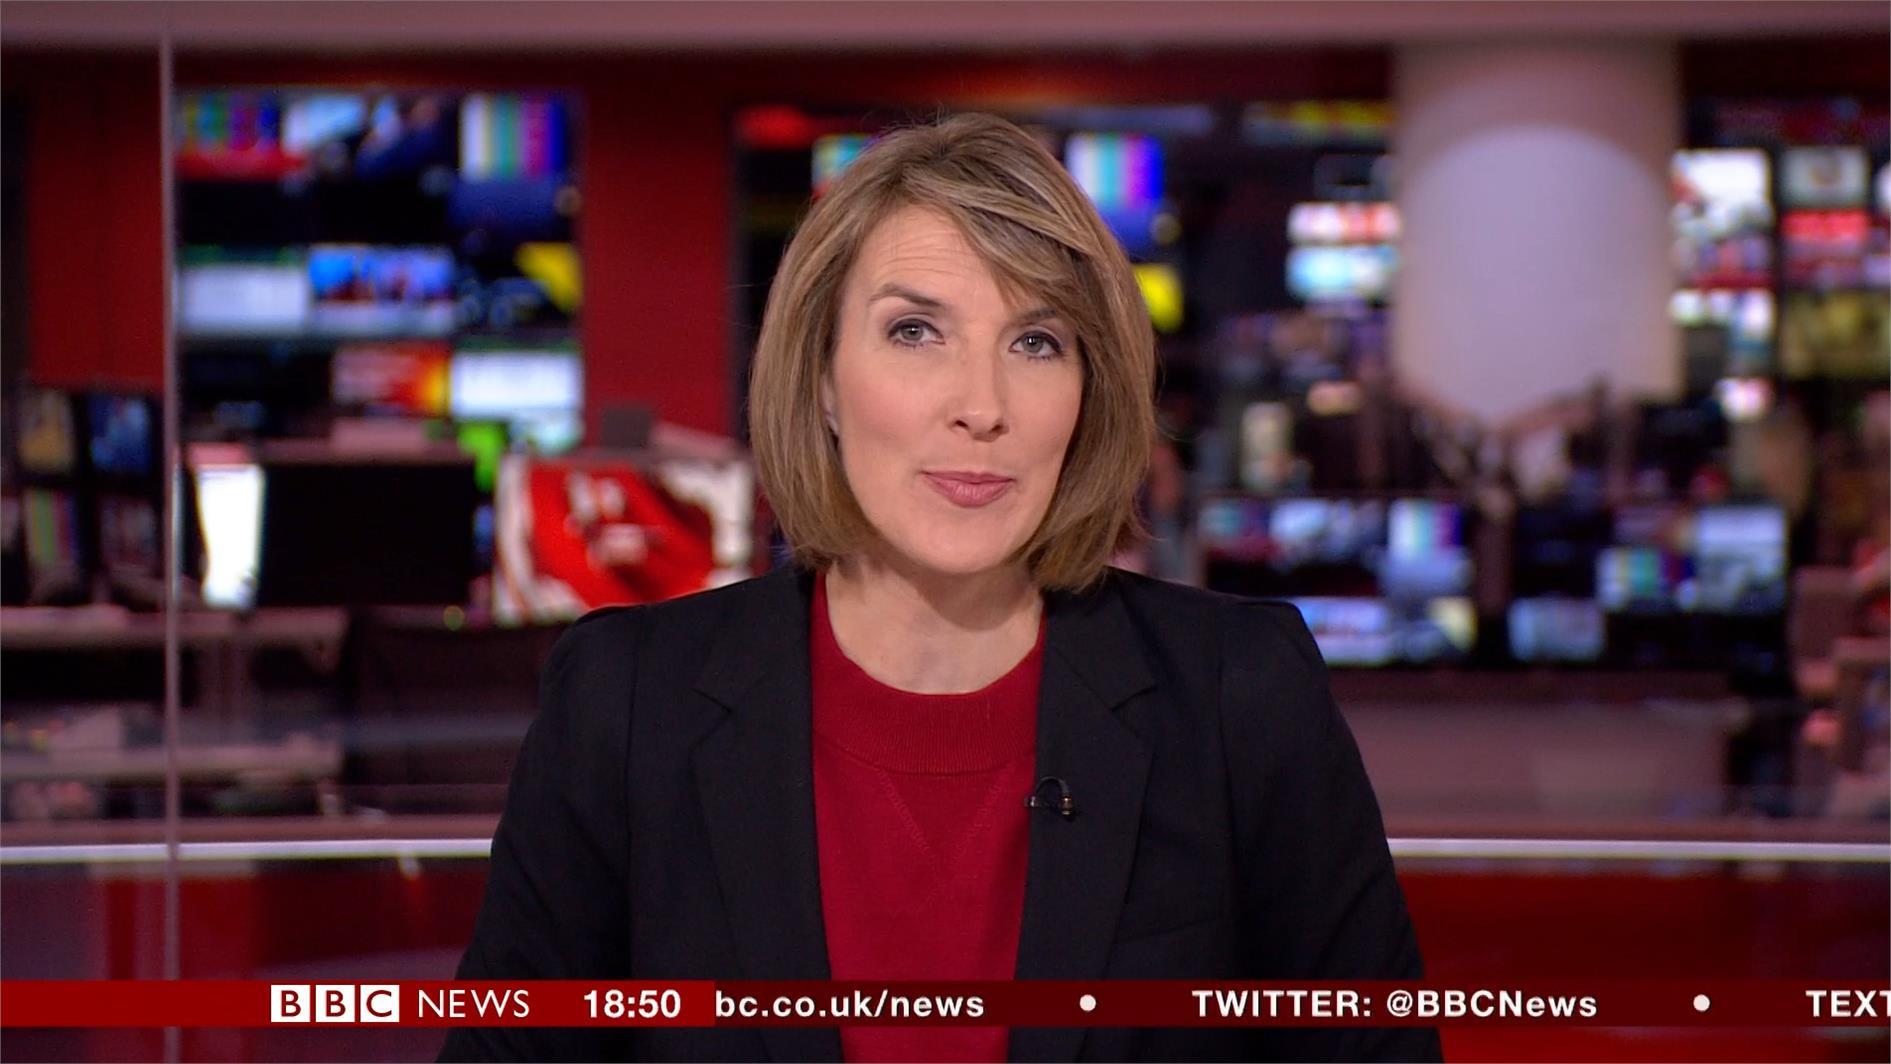 Rachel Schofield - BBC News Presenter (3)